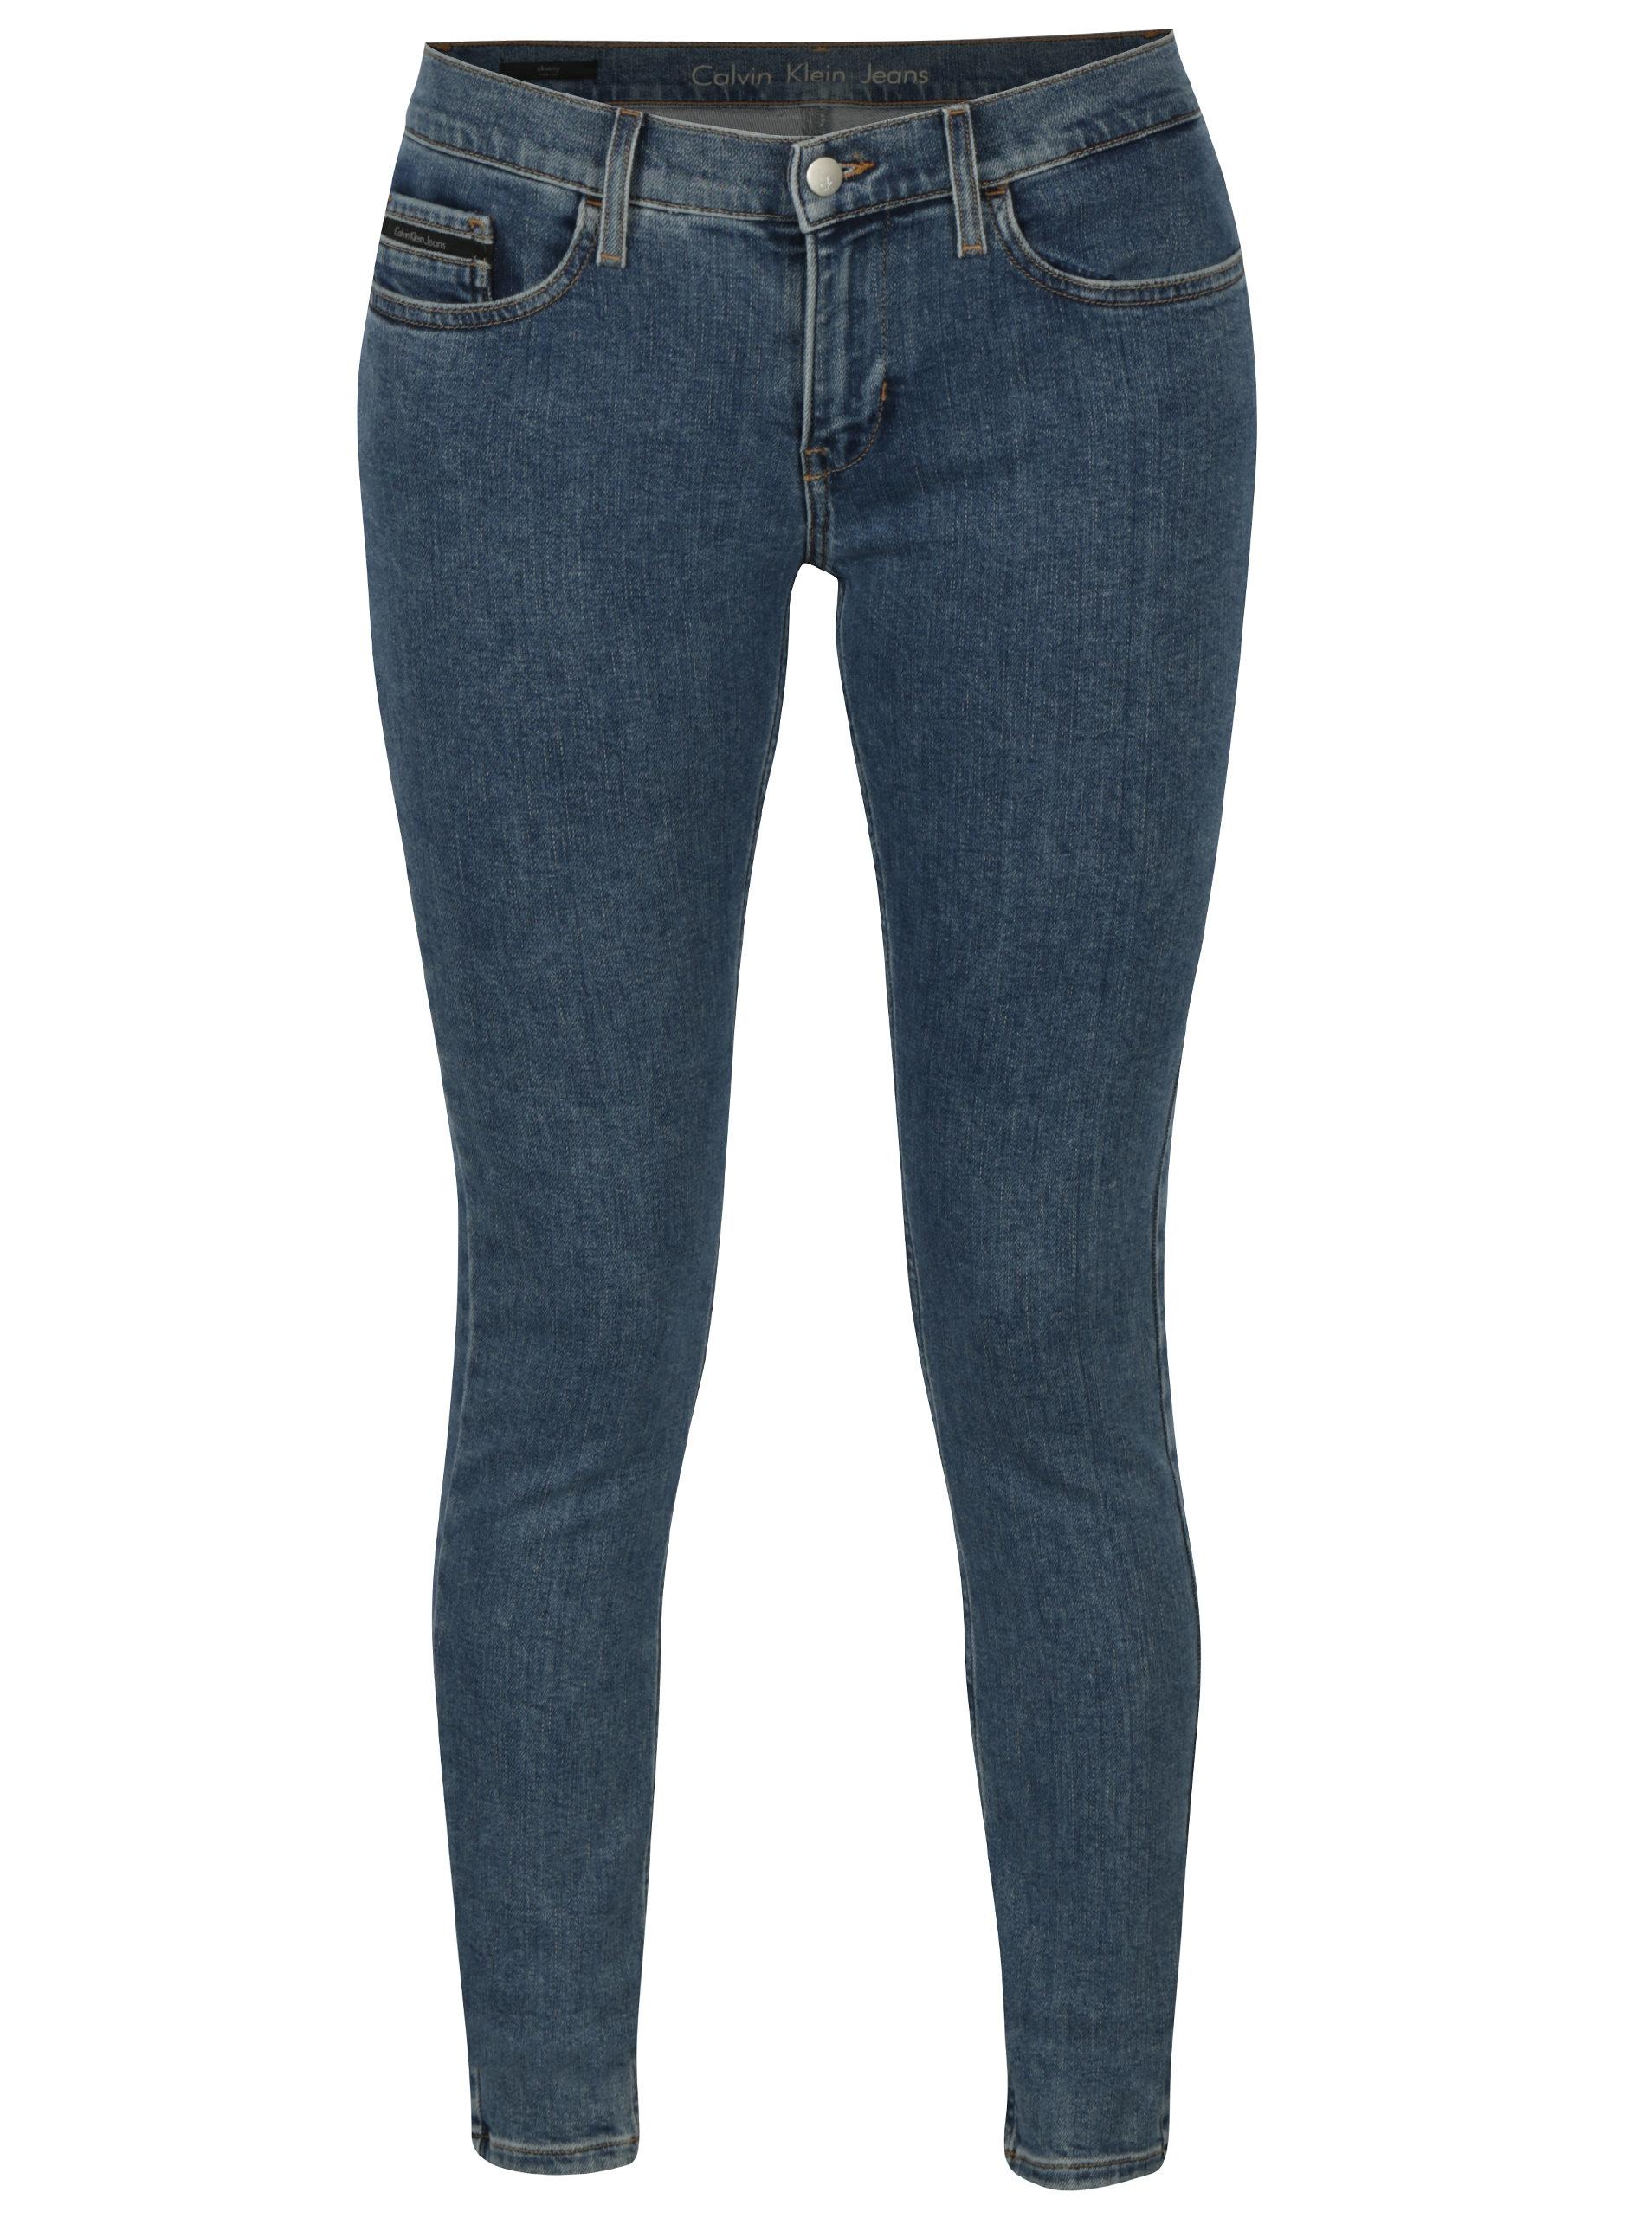 Modré dámské skinny džíny Calvin Klein Jeans Barkly ... 68a225df8d